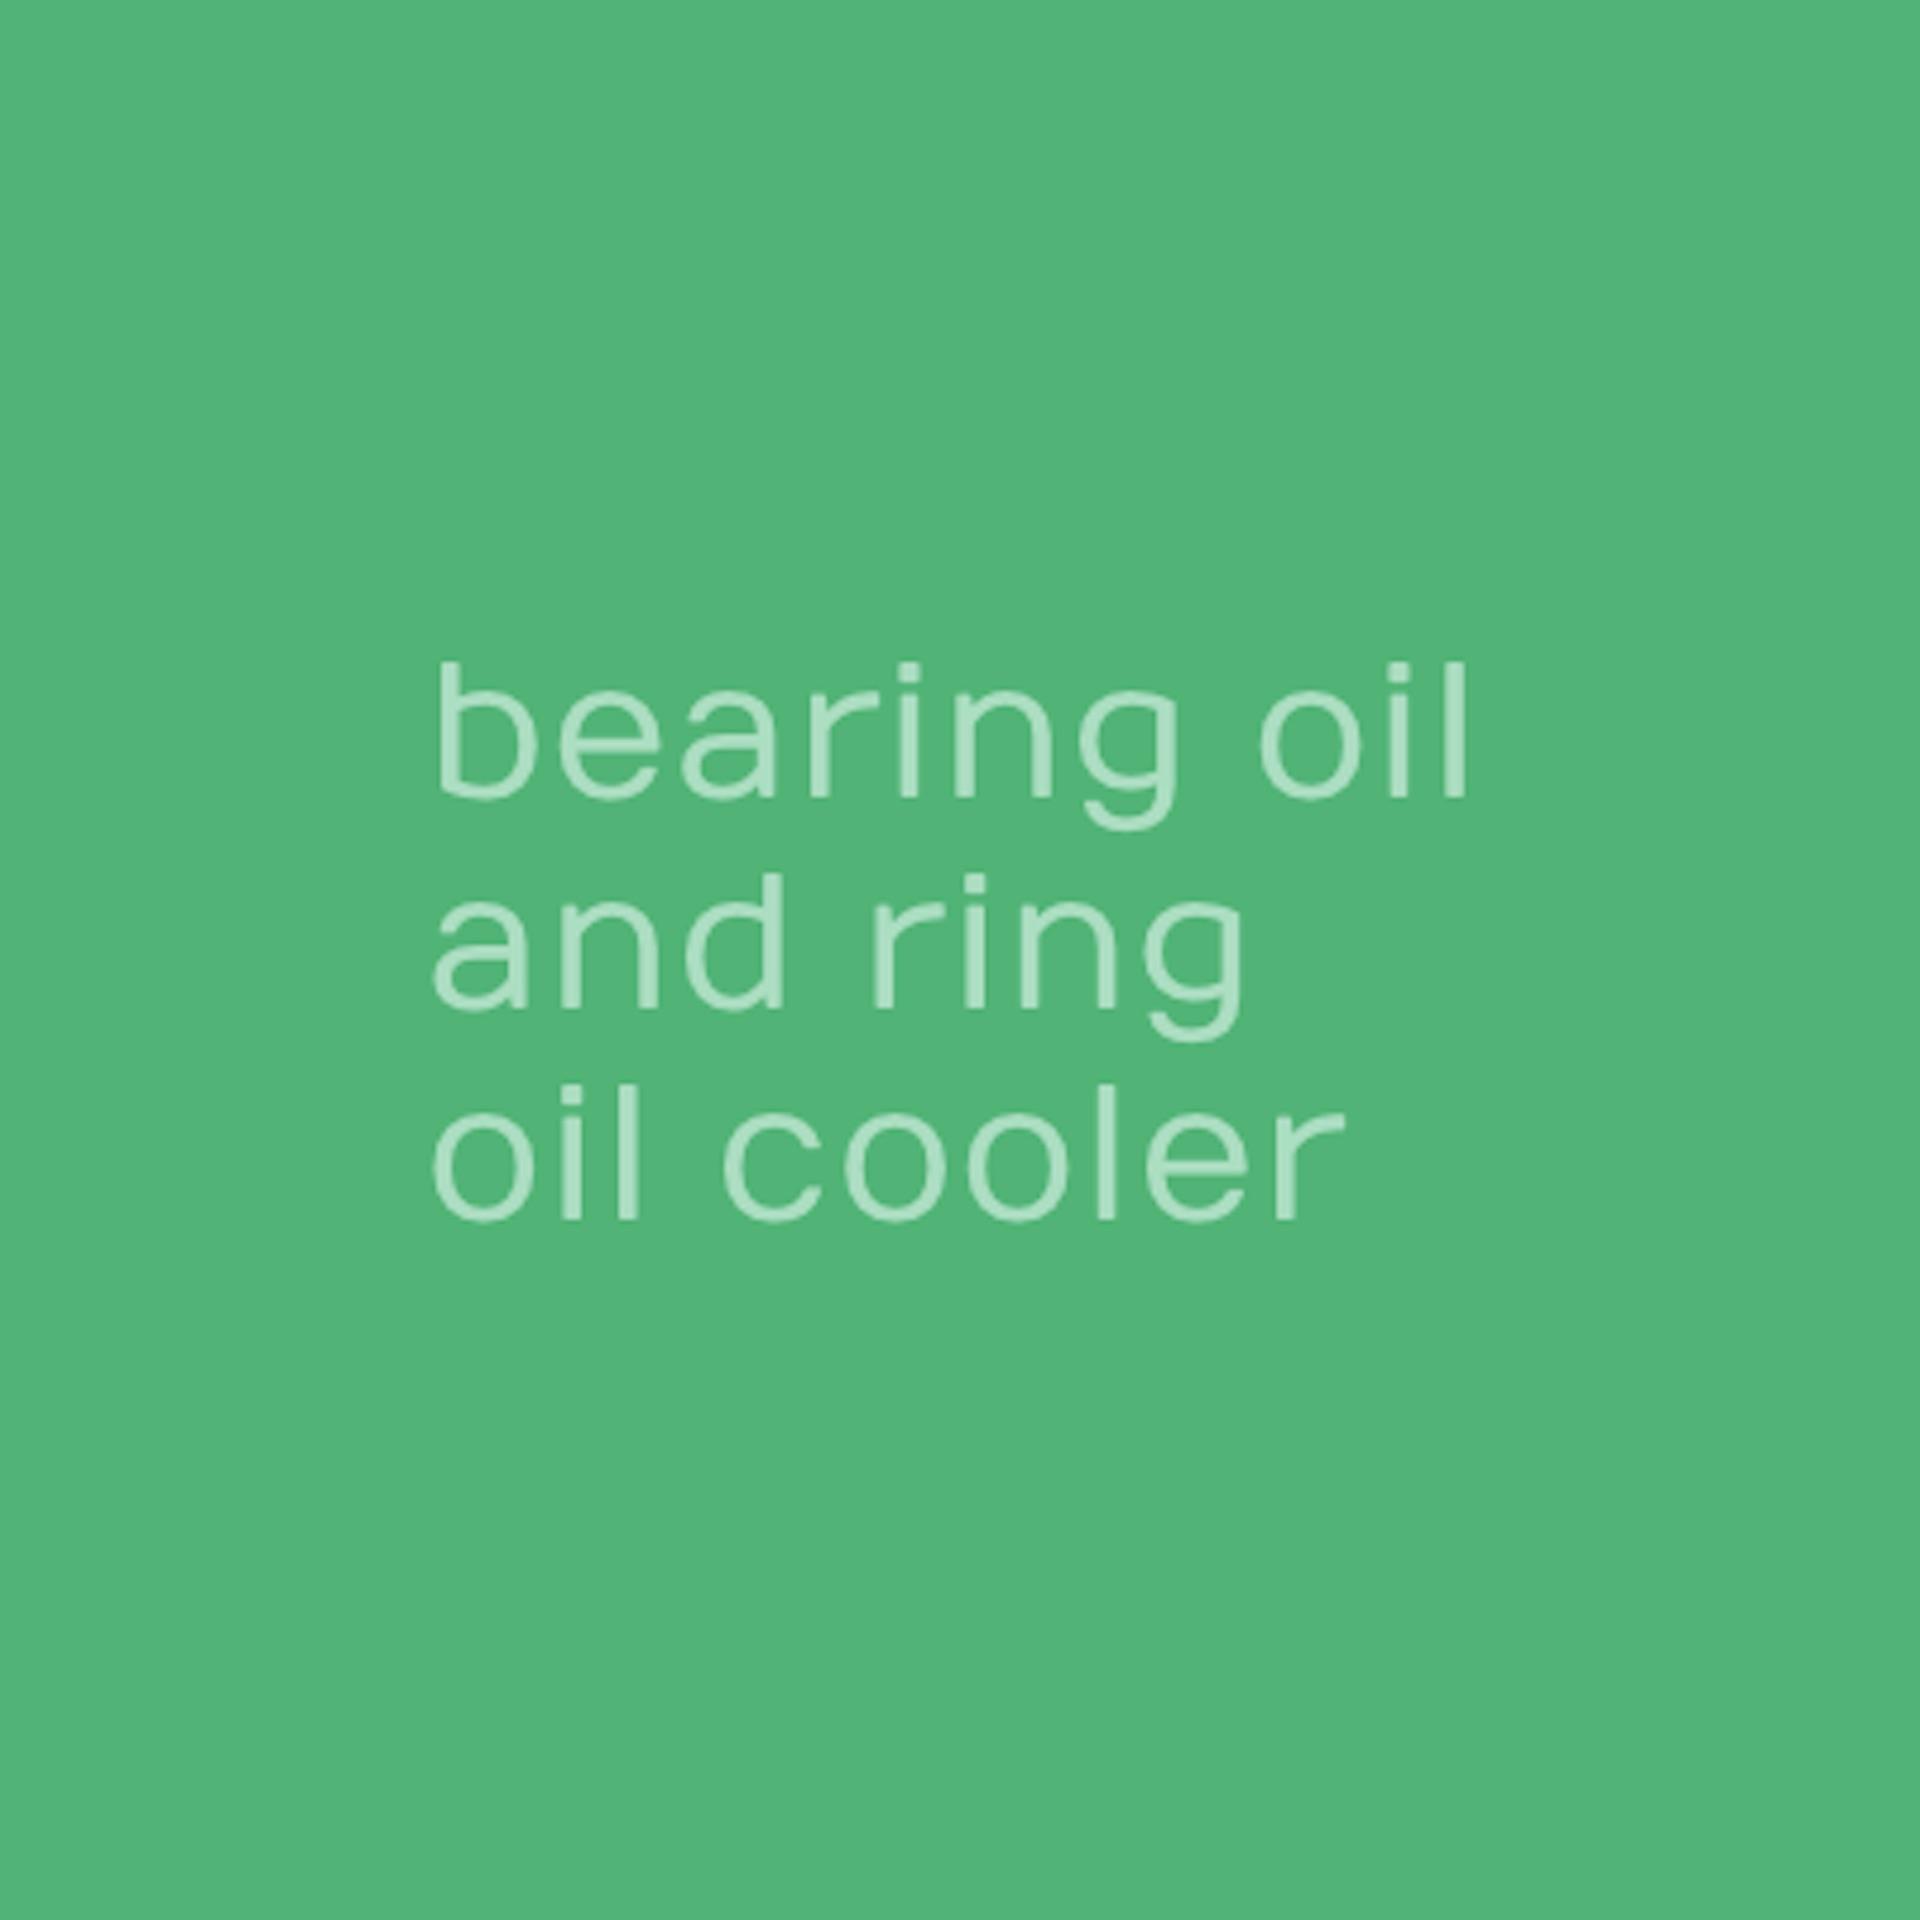 GWA_ring_oil_cooler_and_bearing_oil_cooler_Gesellschaft_fuer_Waerme_und_Anlagentechnik_mbH_monochrom